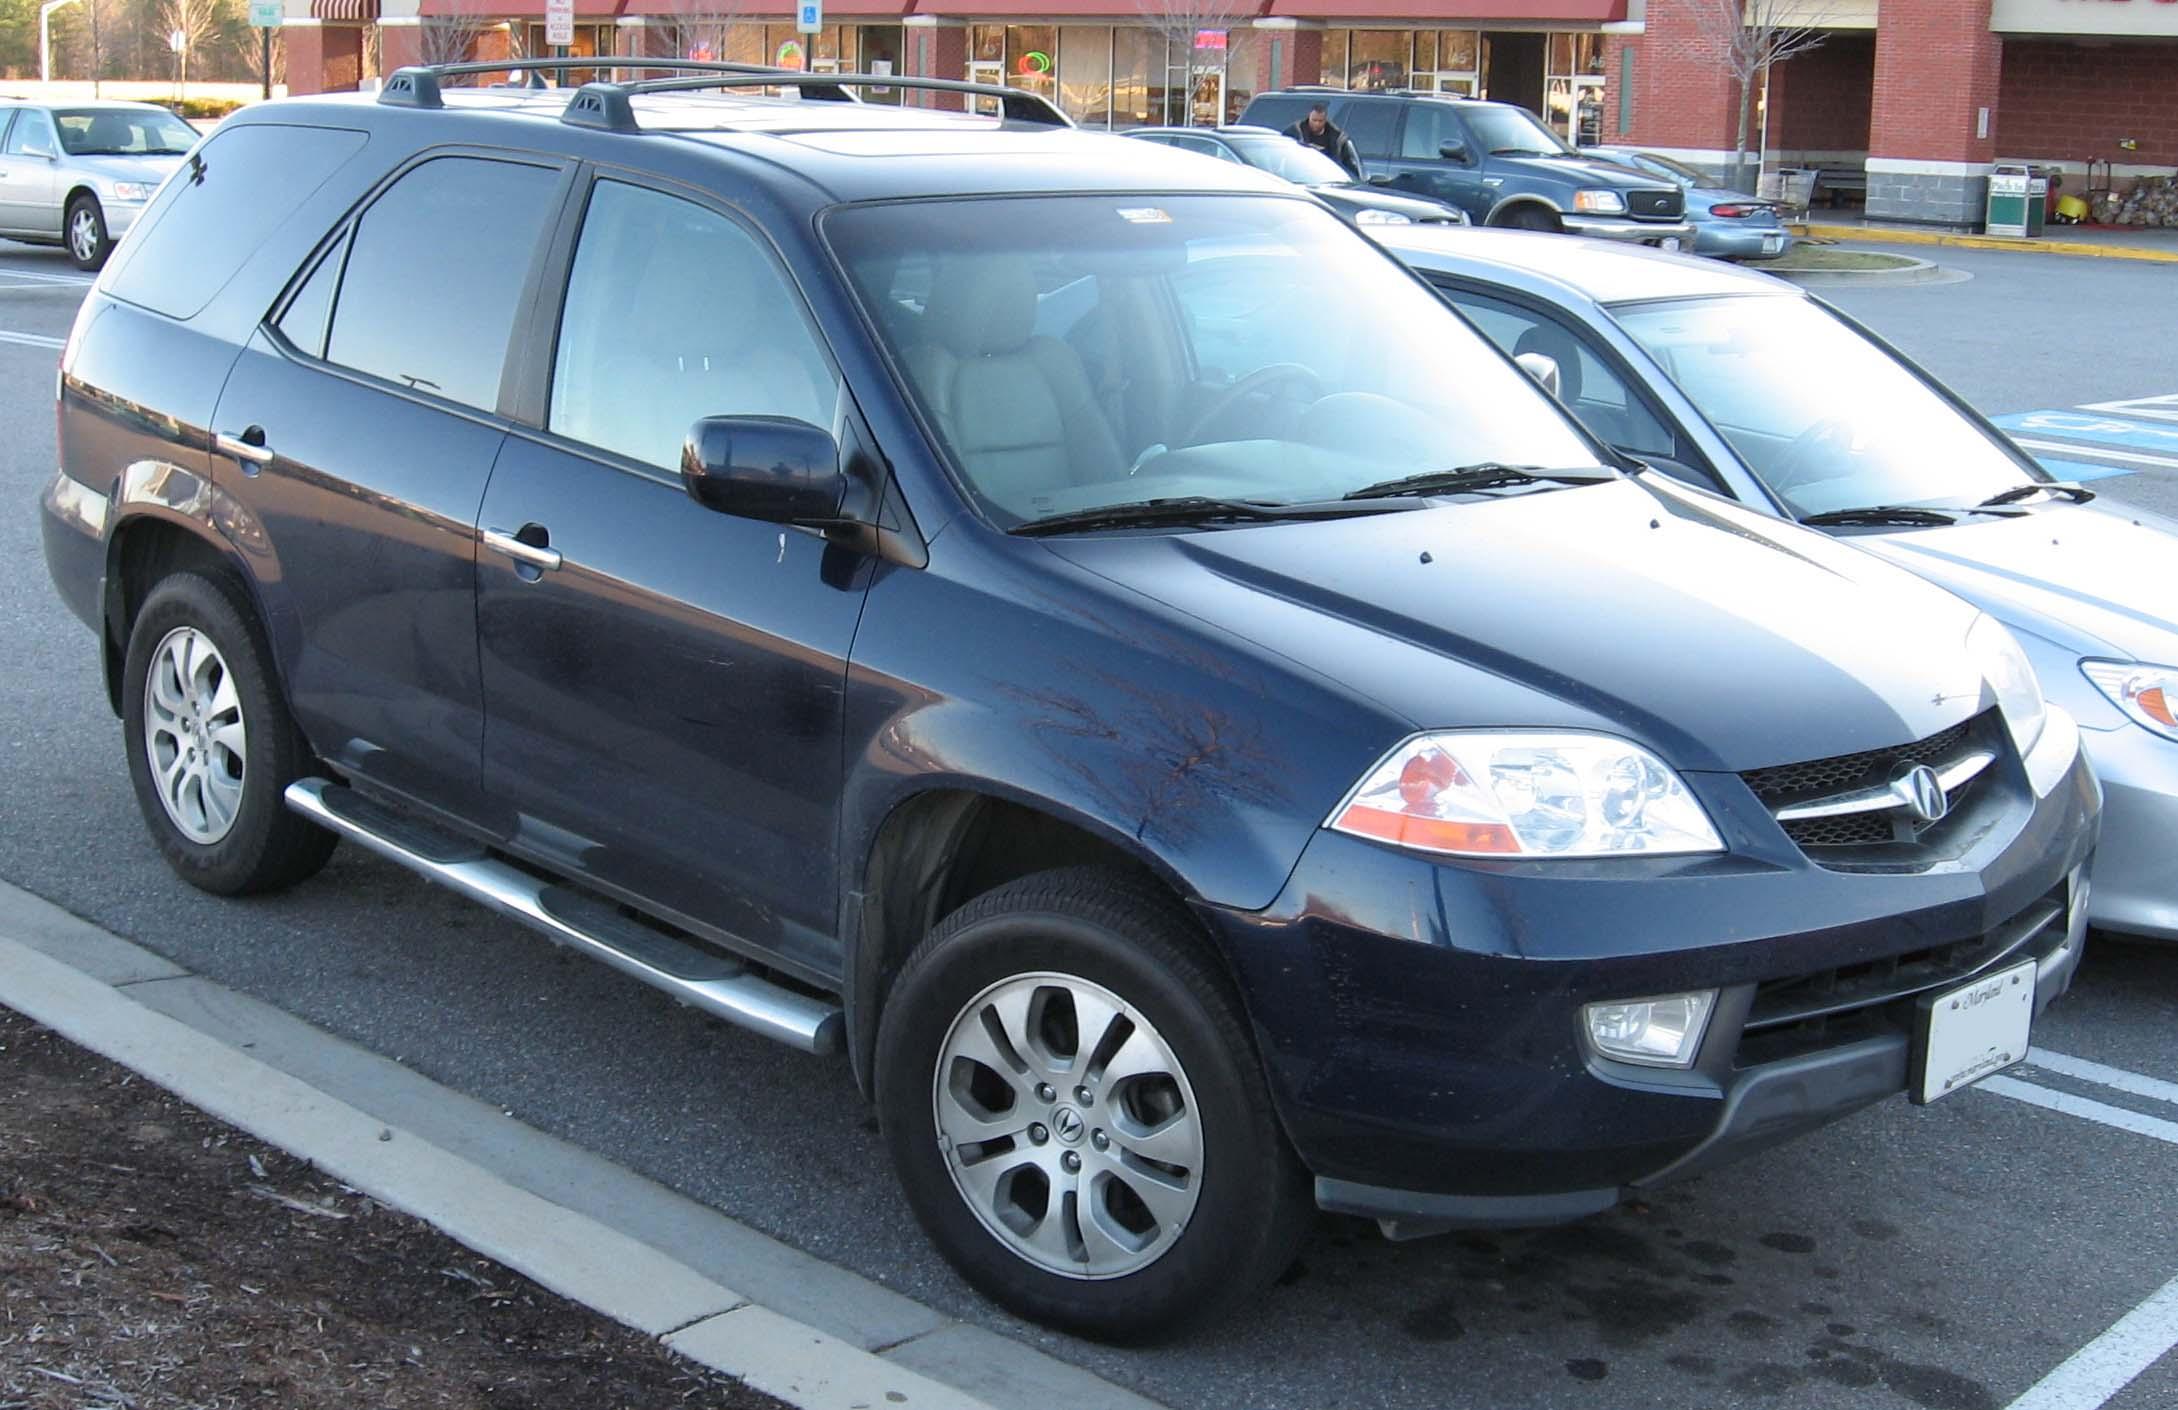 File:2001-03 Acura MDX.jpg - Wikimedia Commons